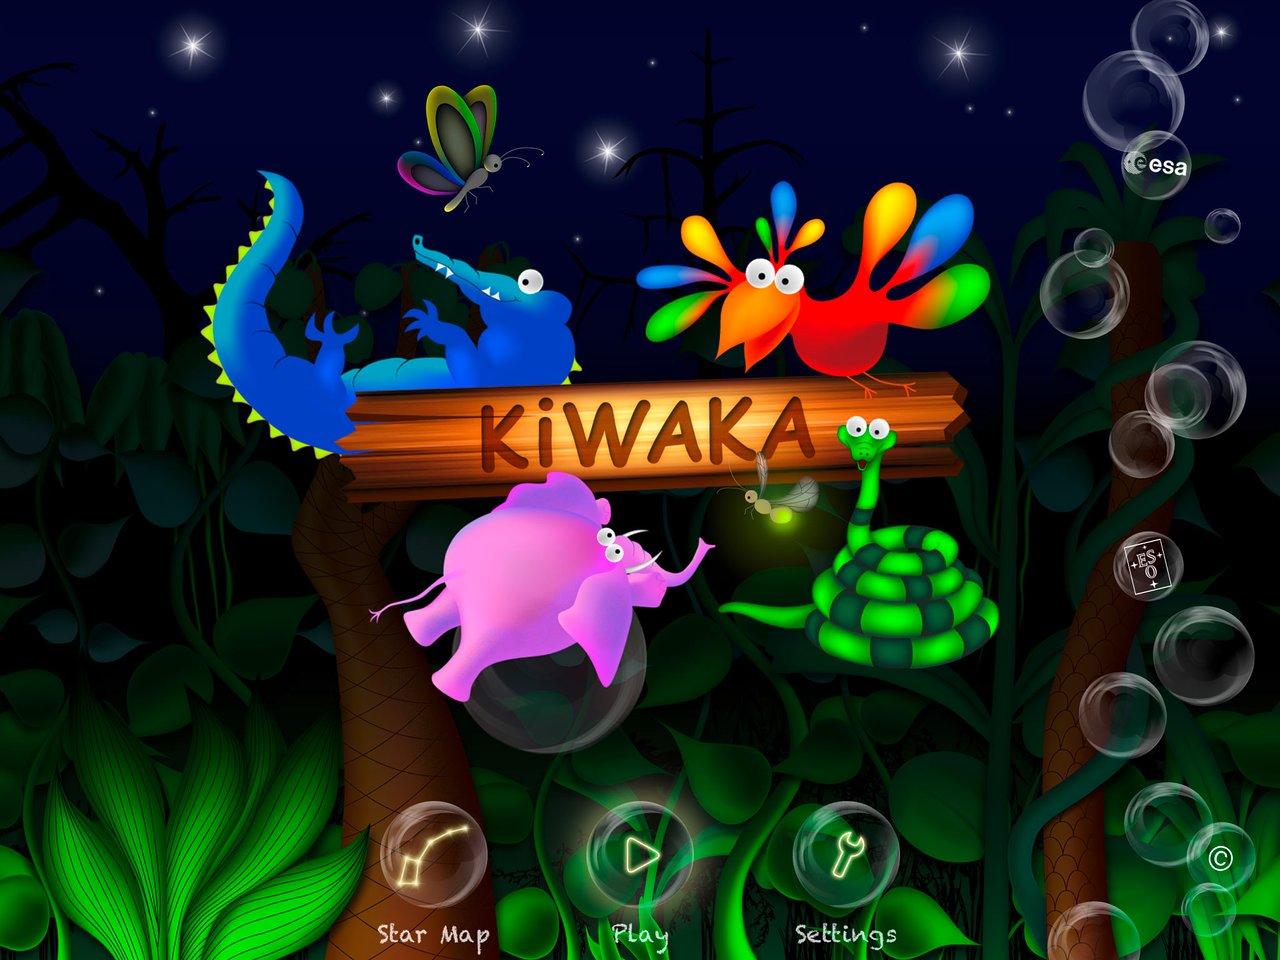 Screenshot of the App Kiwaka